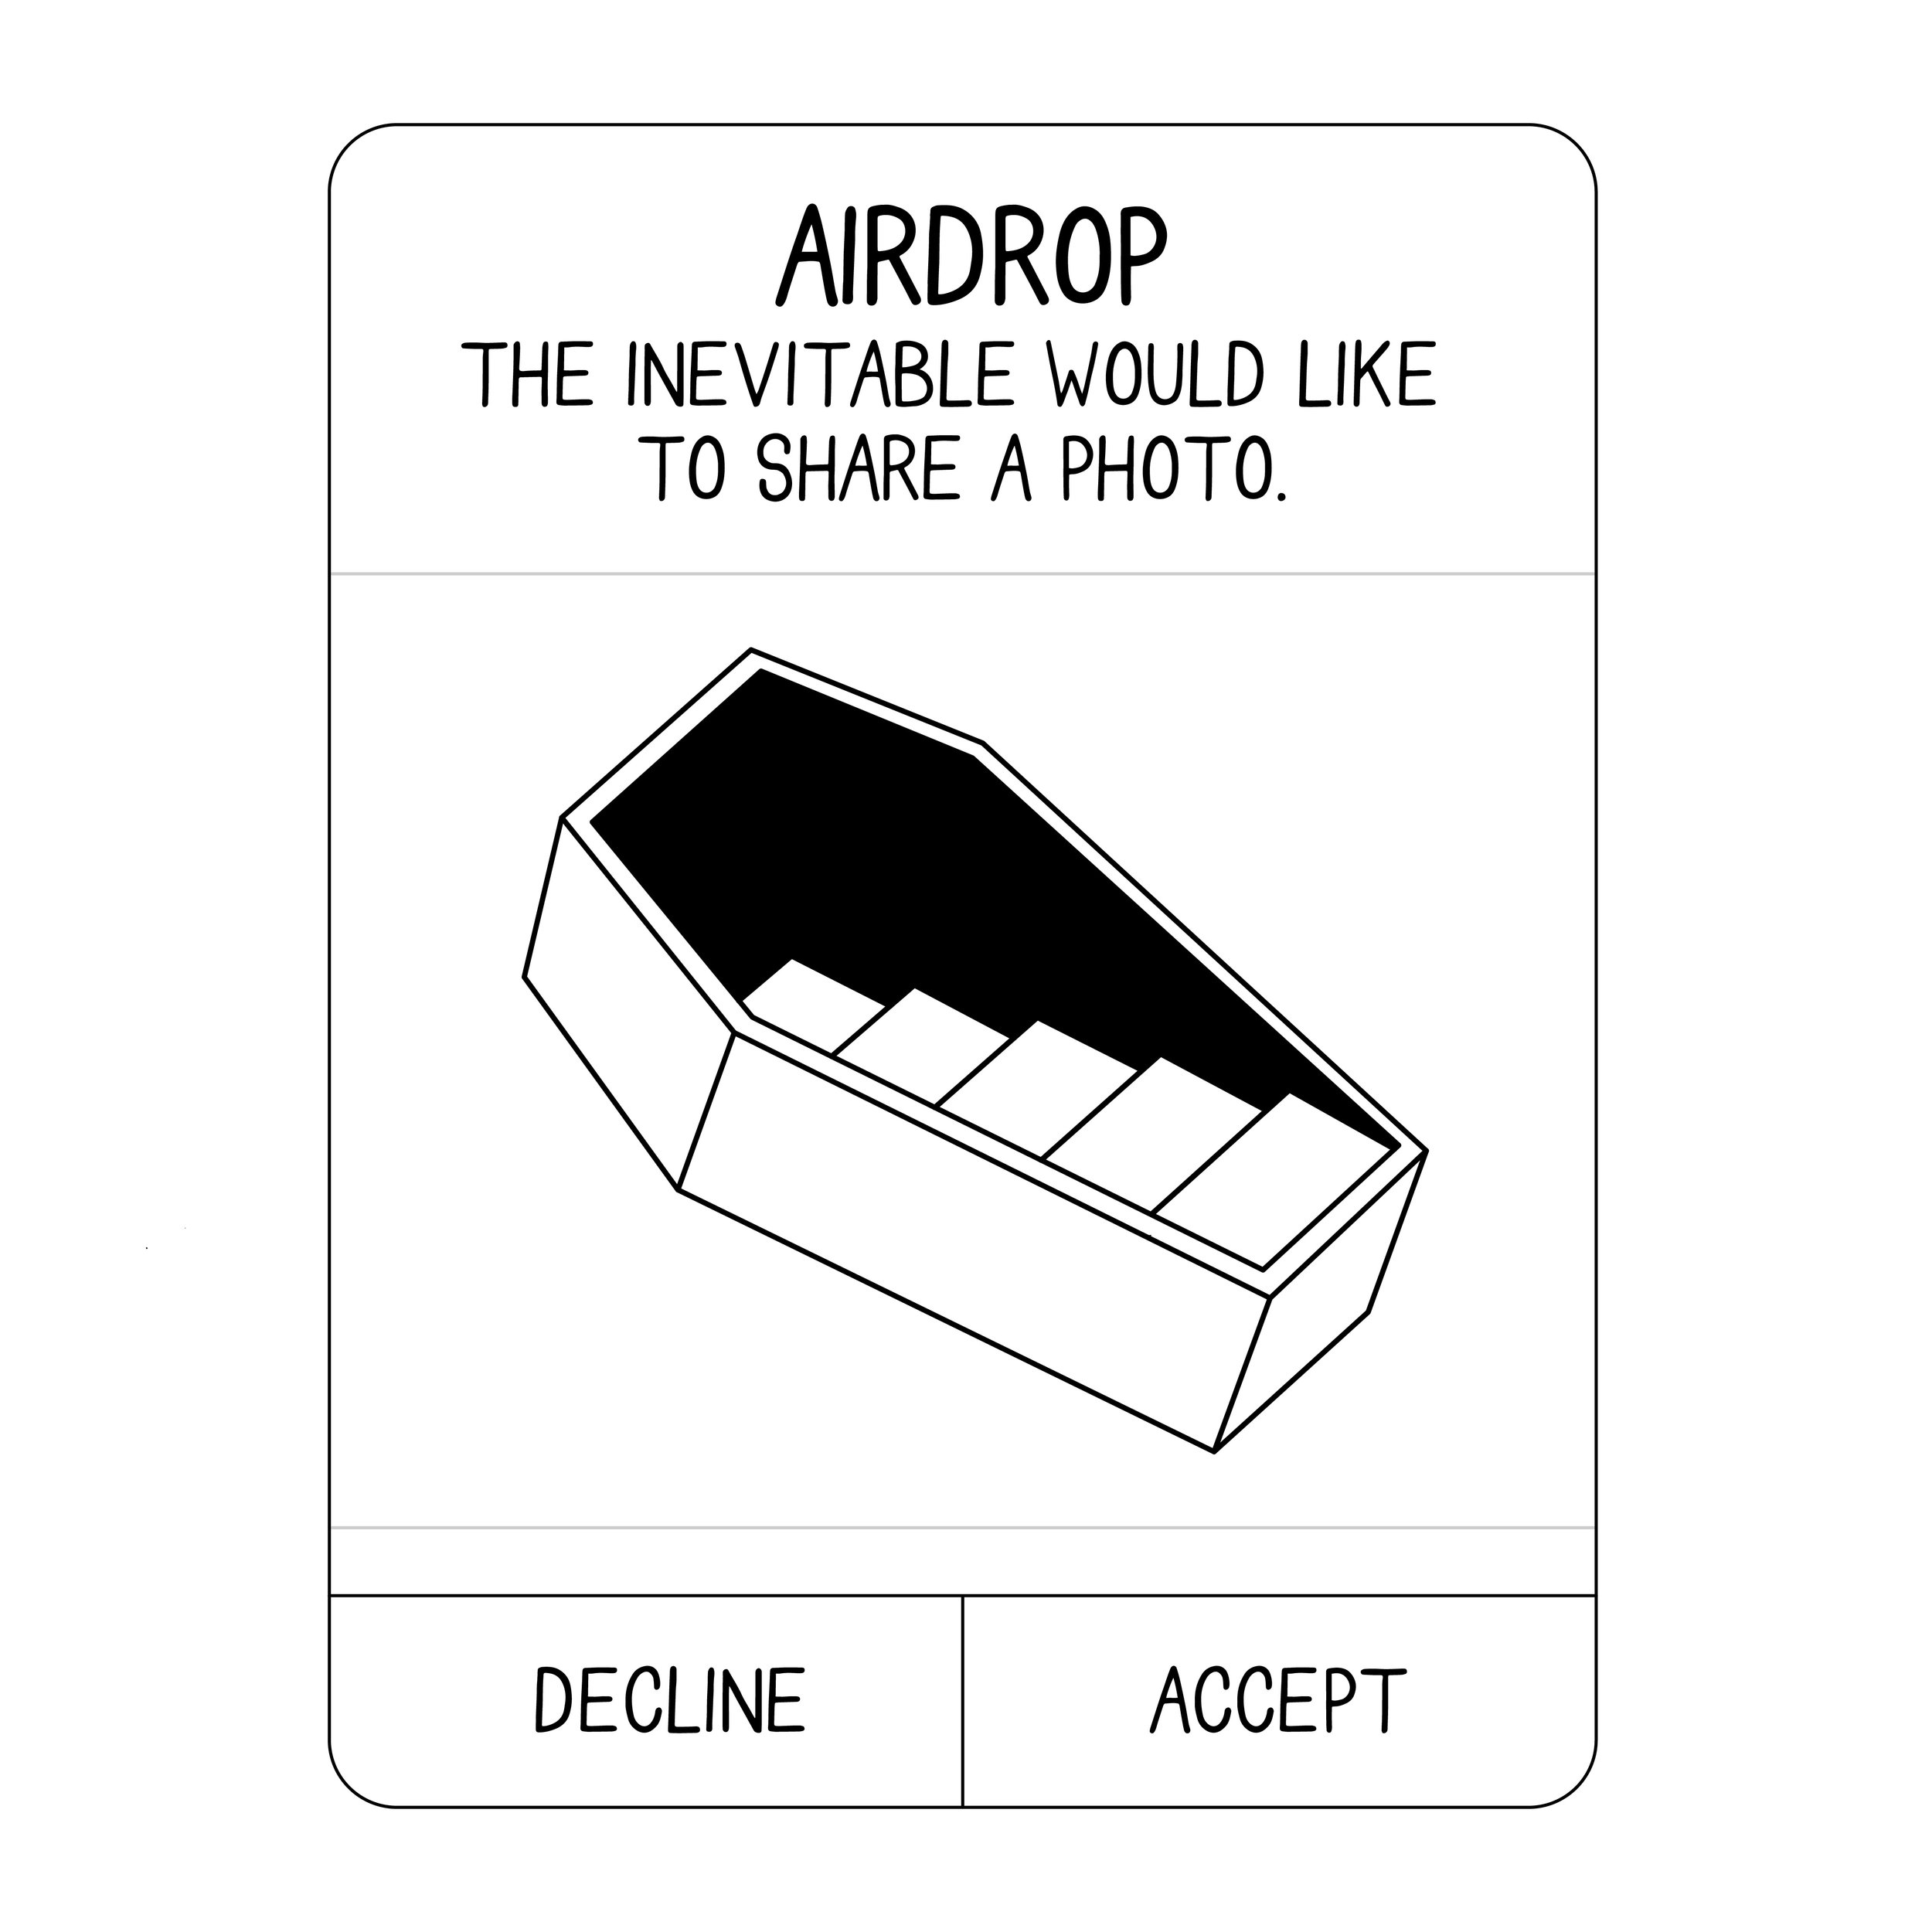 airdrop-01.jpg